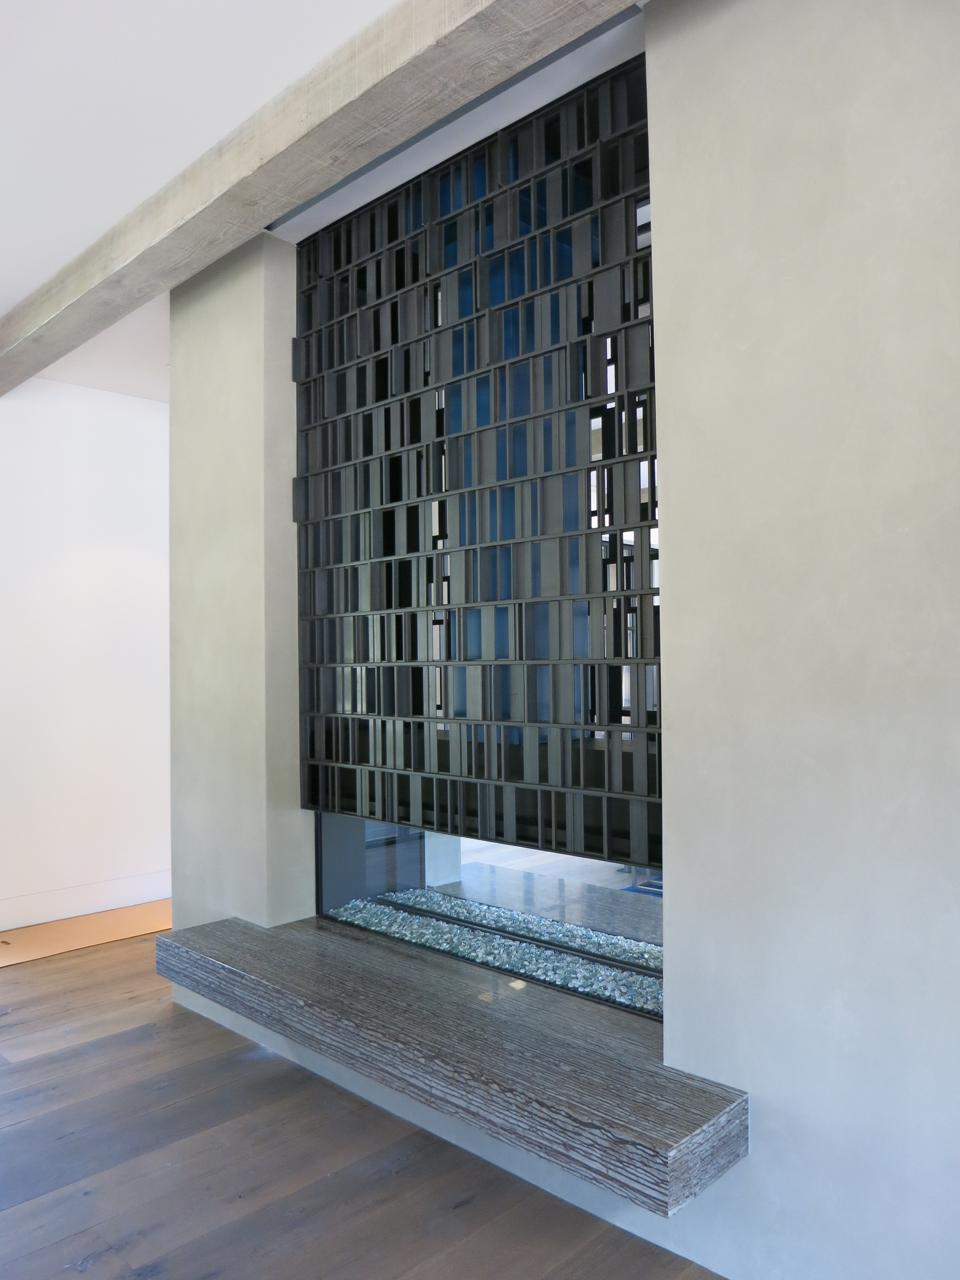 Sonoma Fireplace